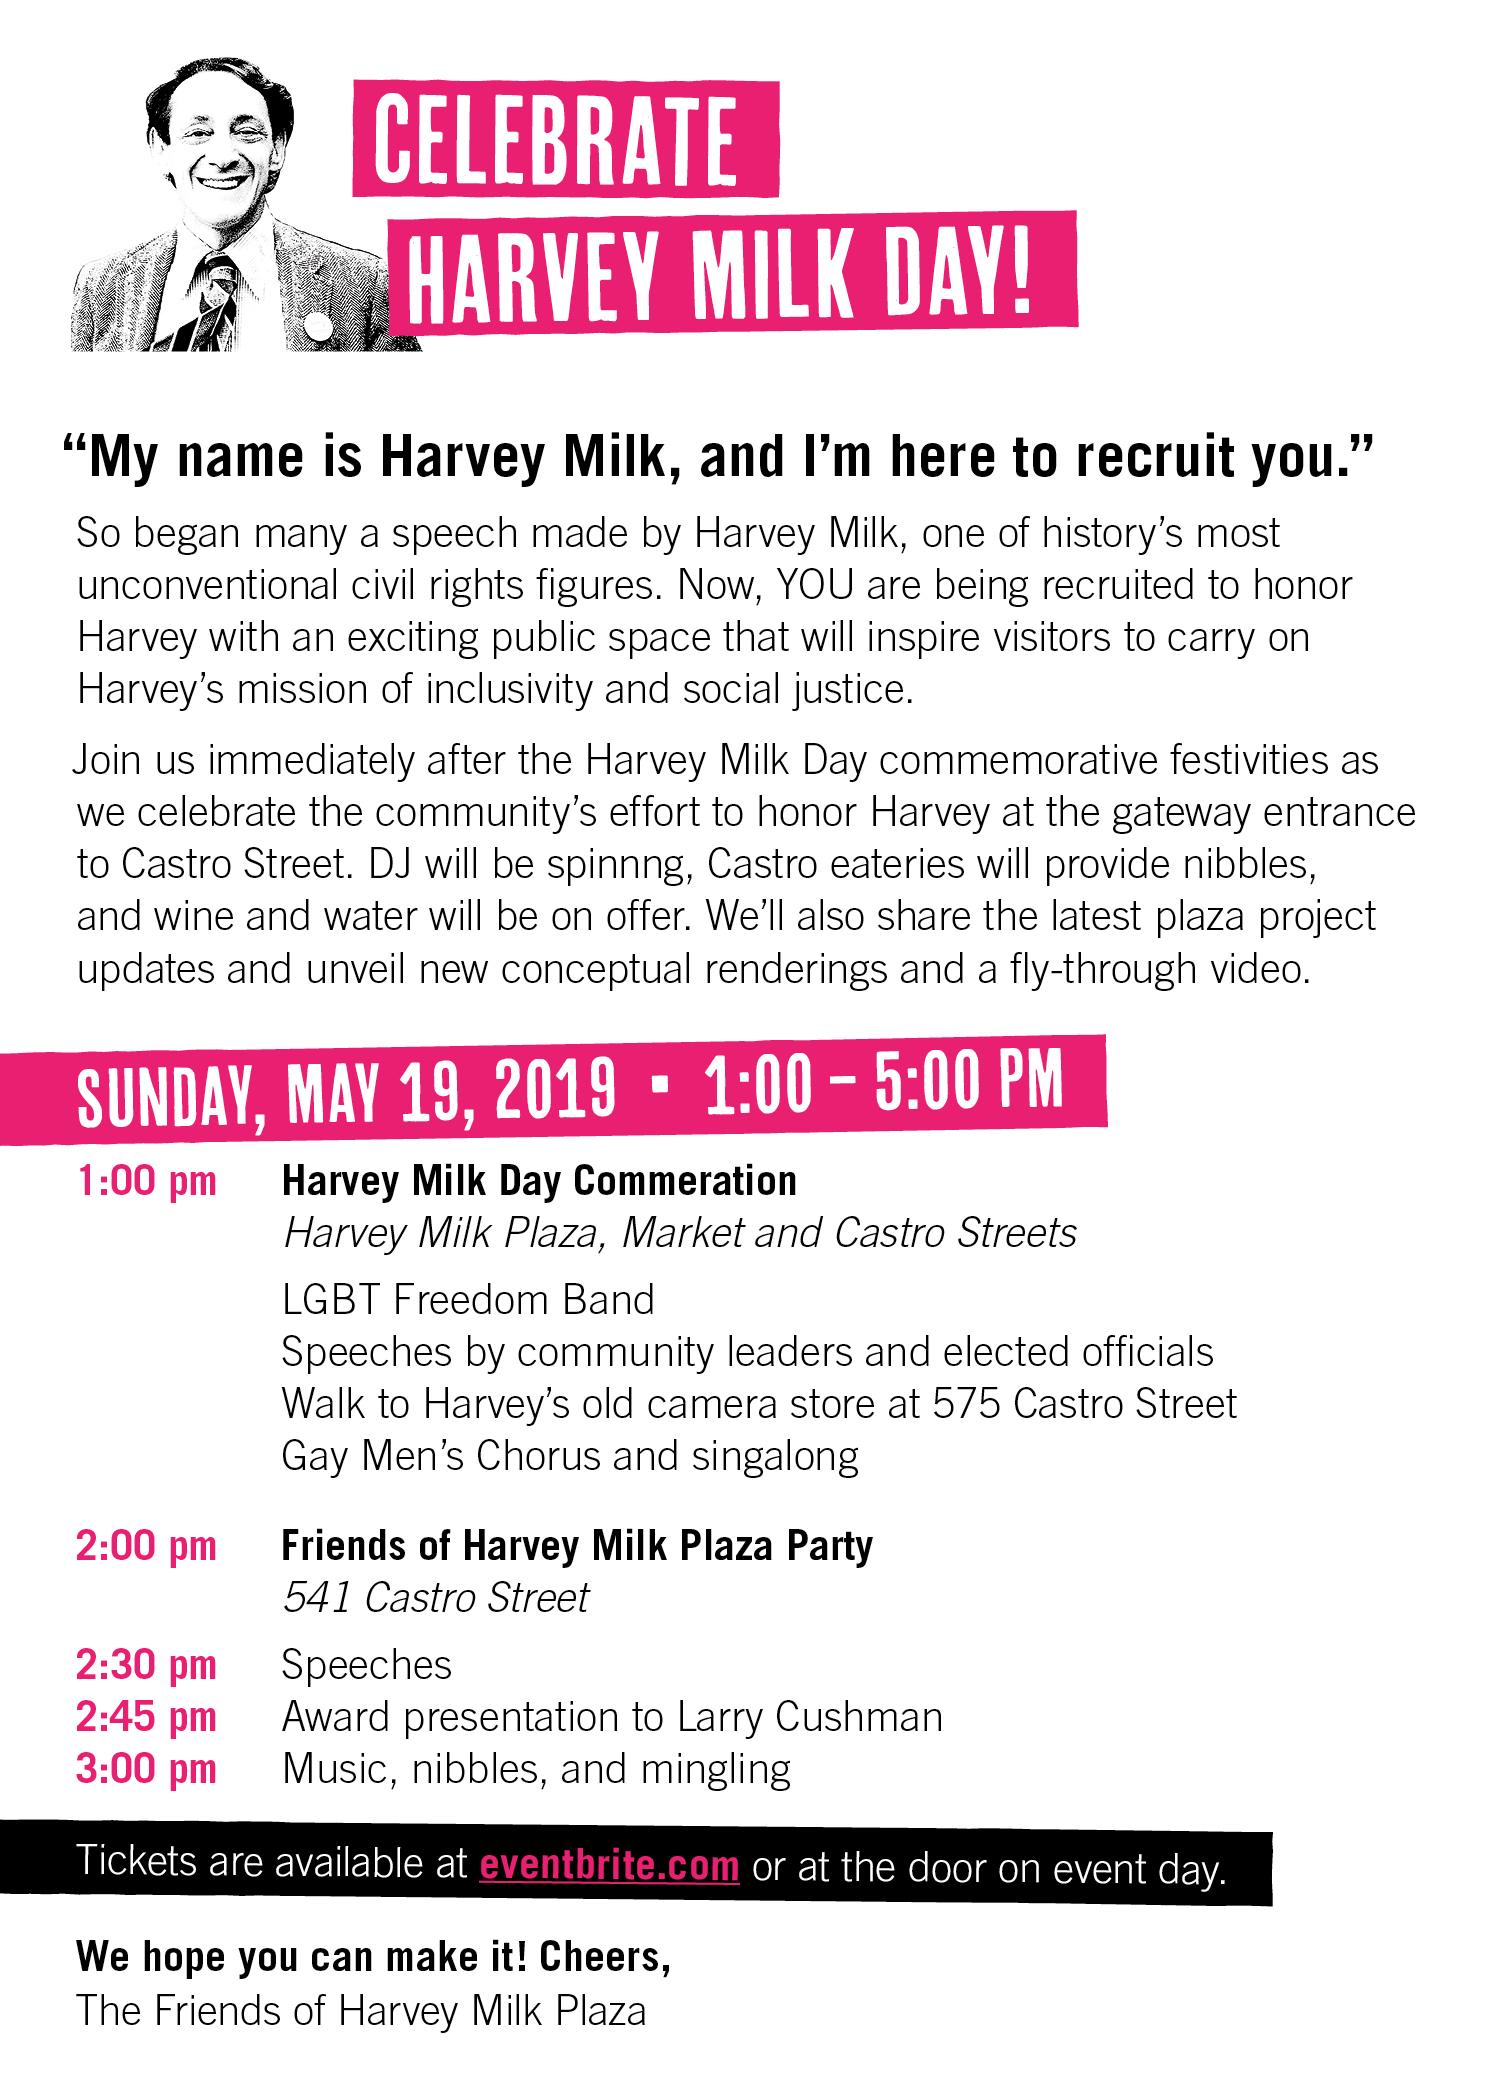 Harvey Milk Day 2019 Invitation General.jpg